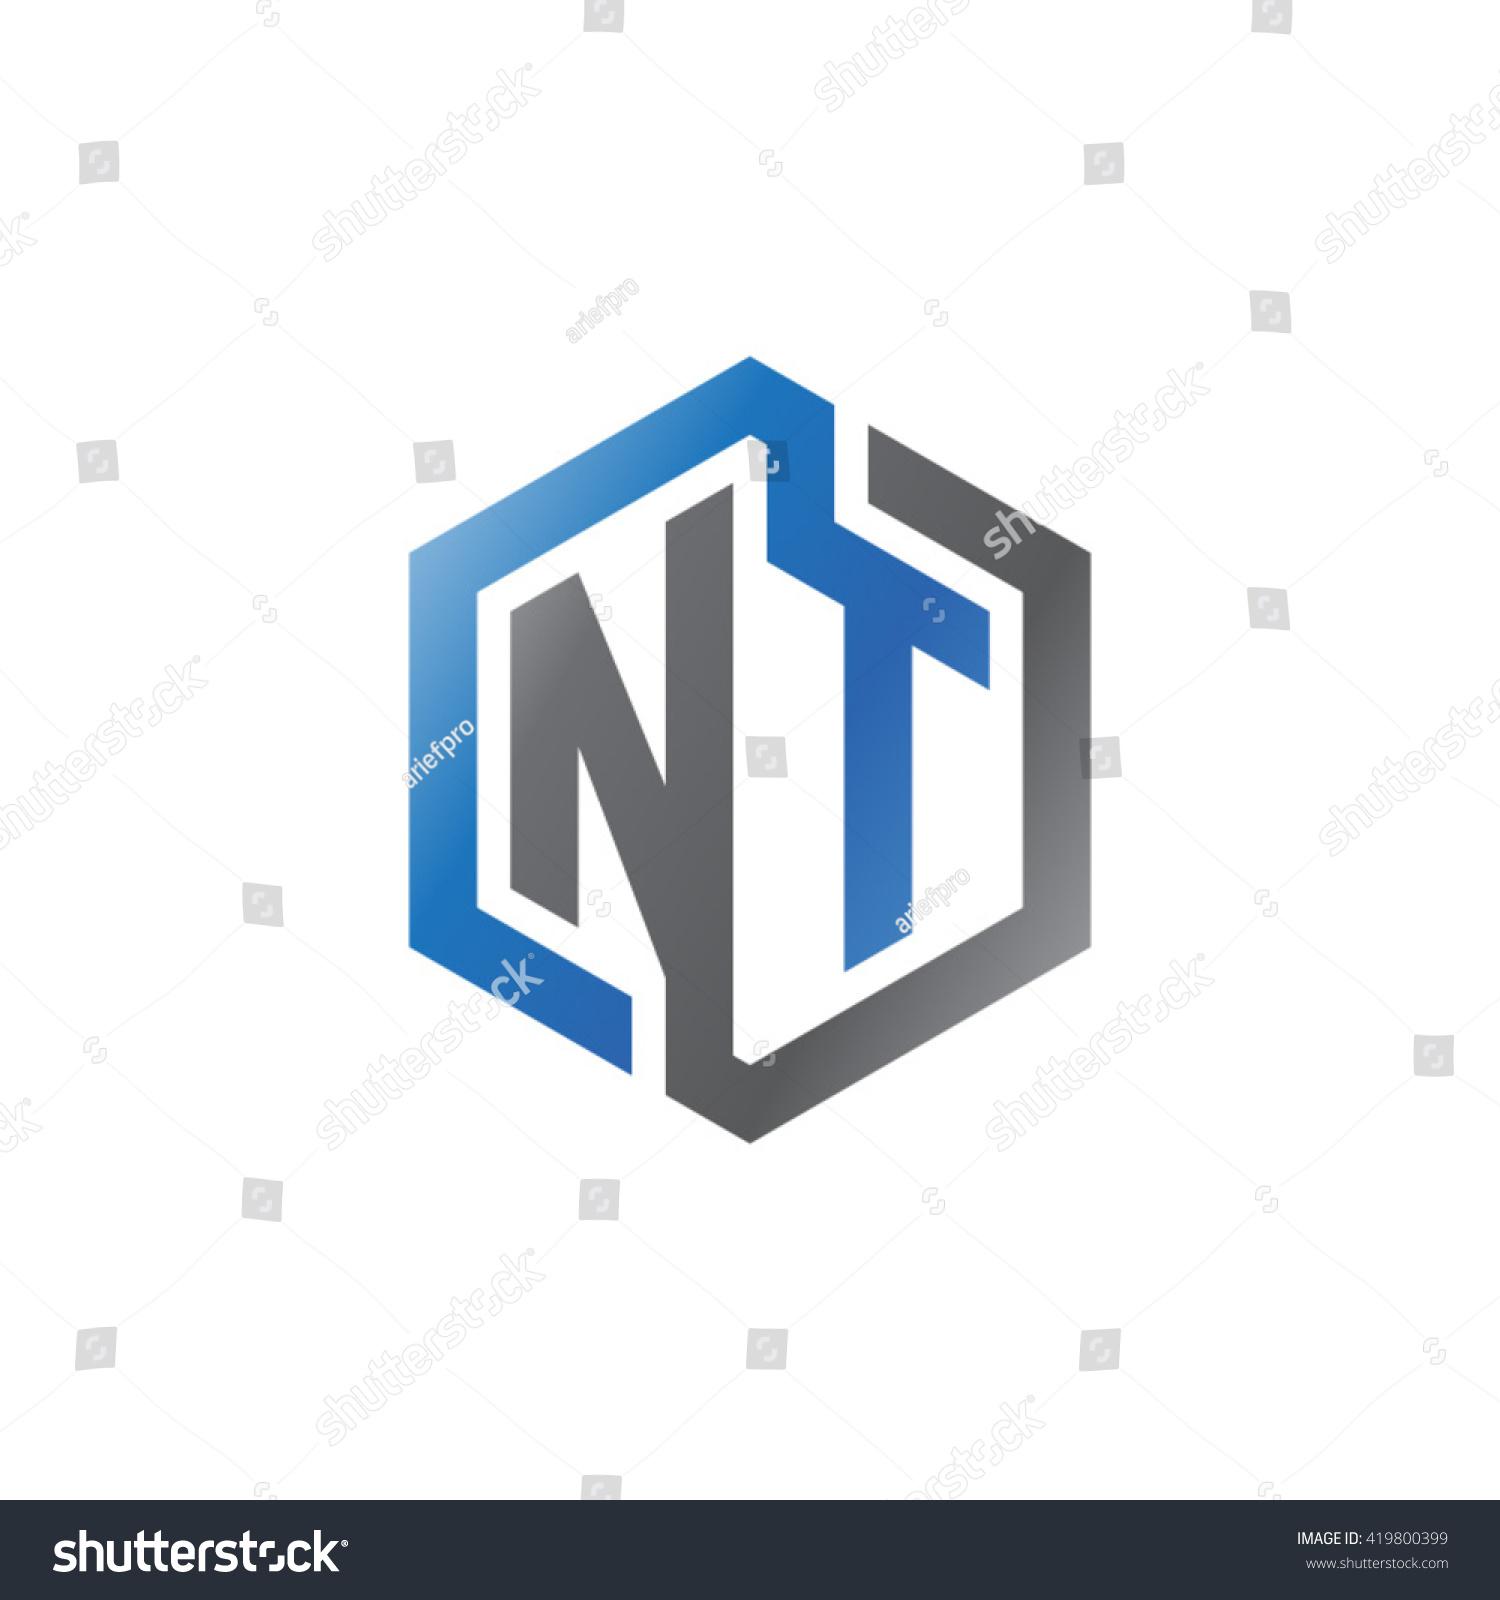 Nt Initial Letters Looping Linked Hexagon Logo Black Gray Blue Ez